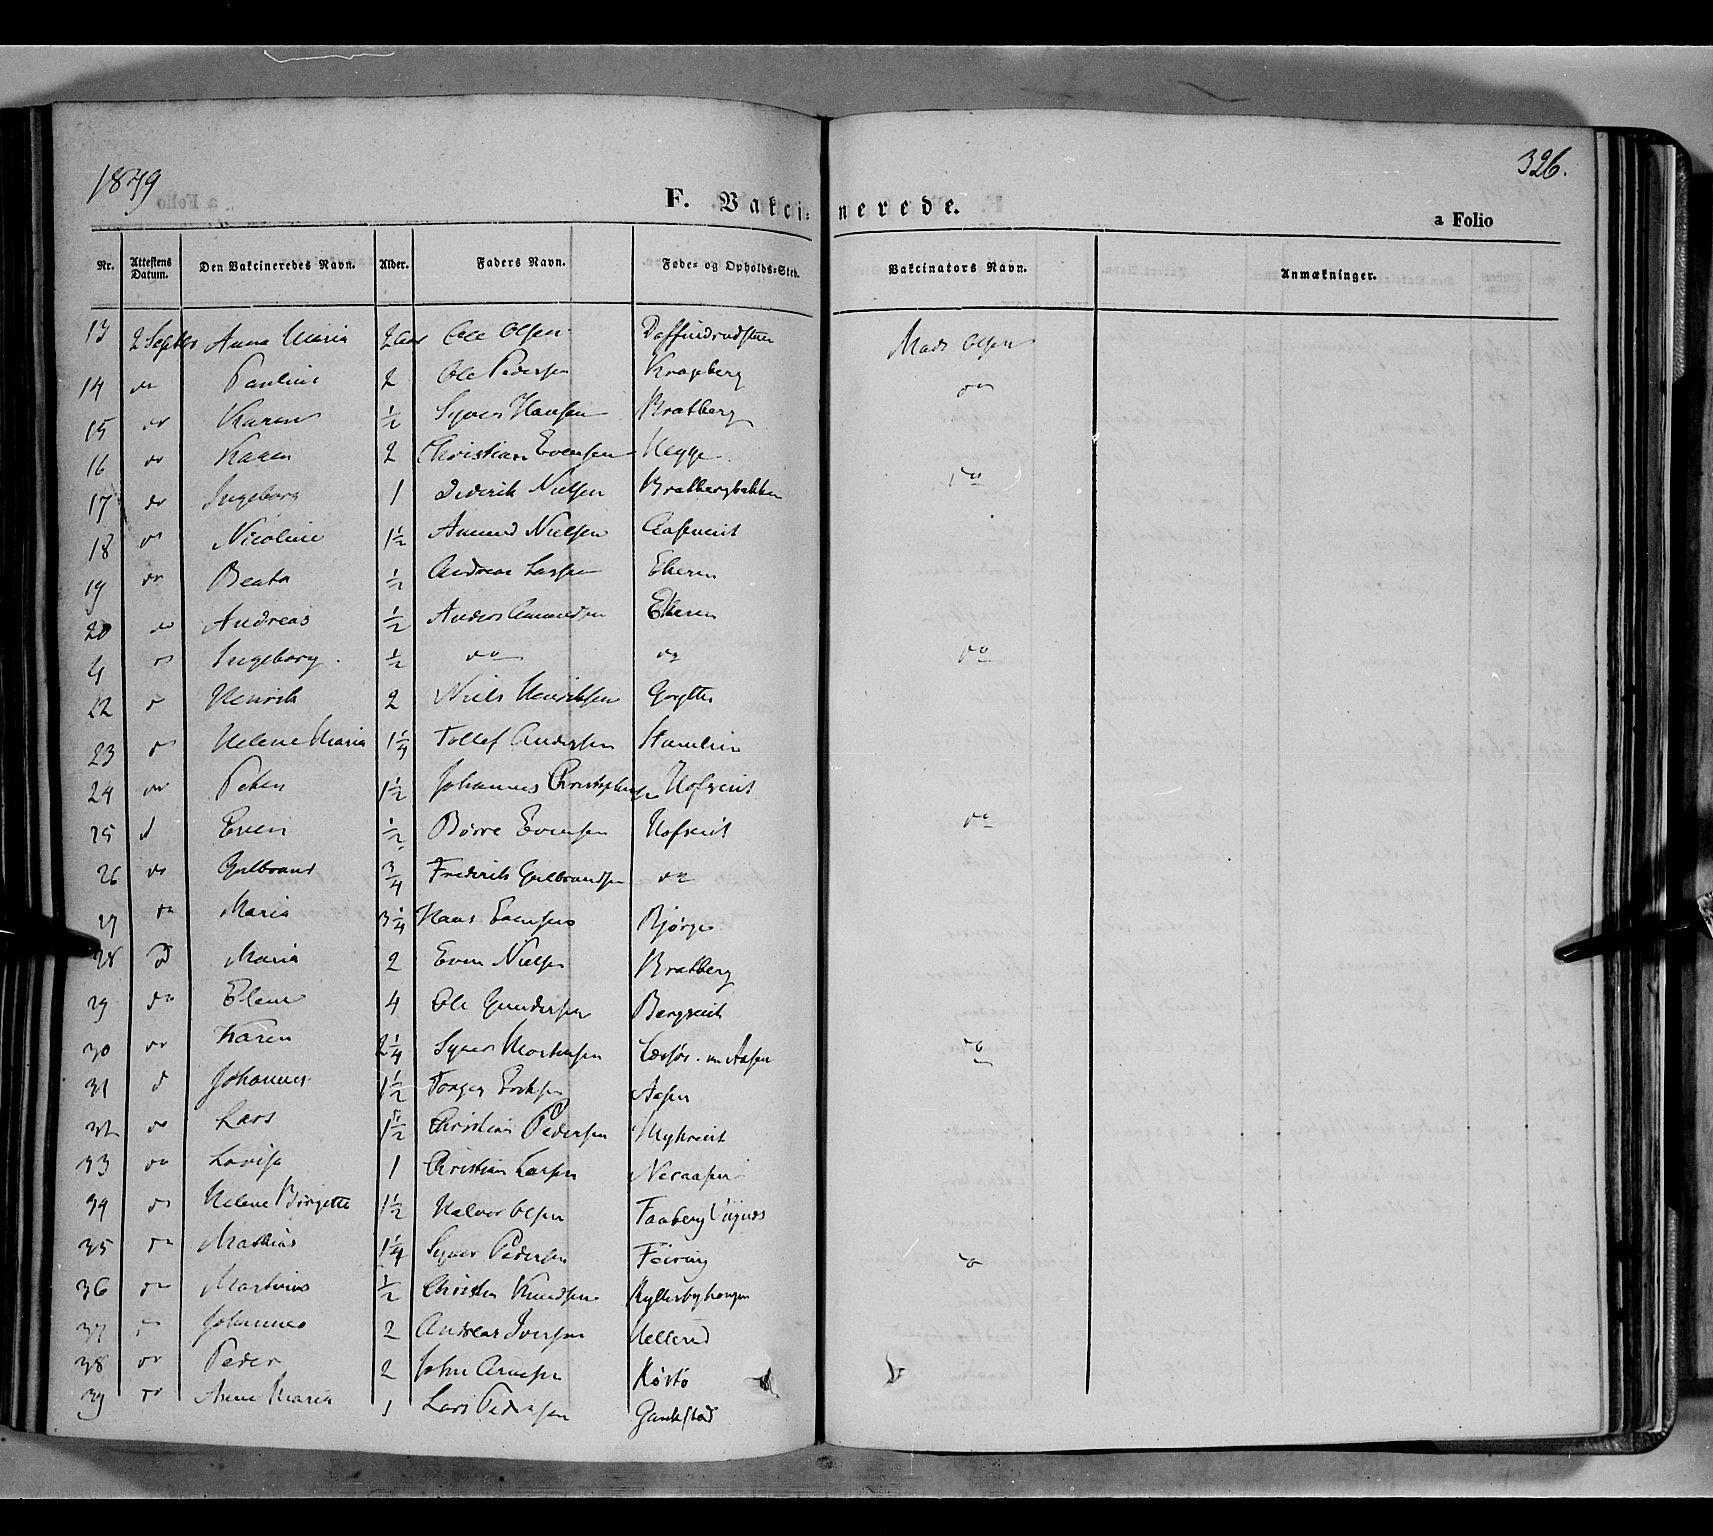 SAH, Biri prestekontor, Ministerialbok nr. 5, 1843-1854, s. 326